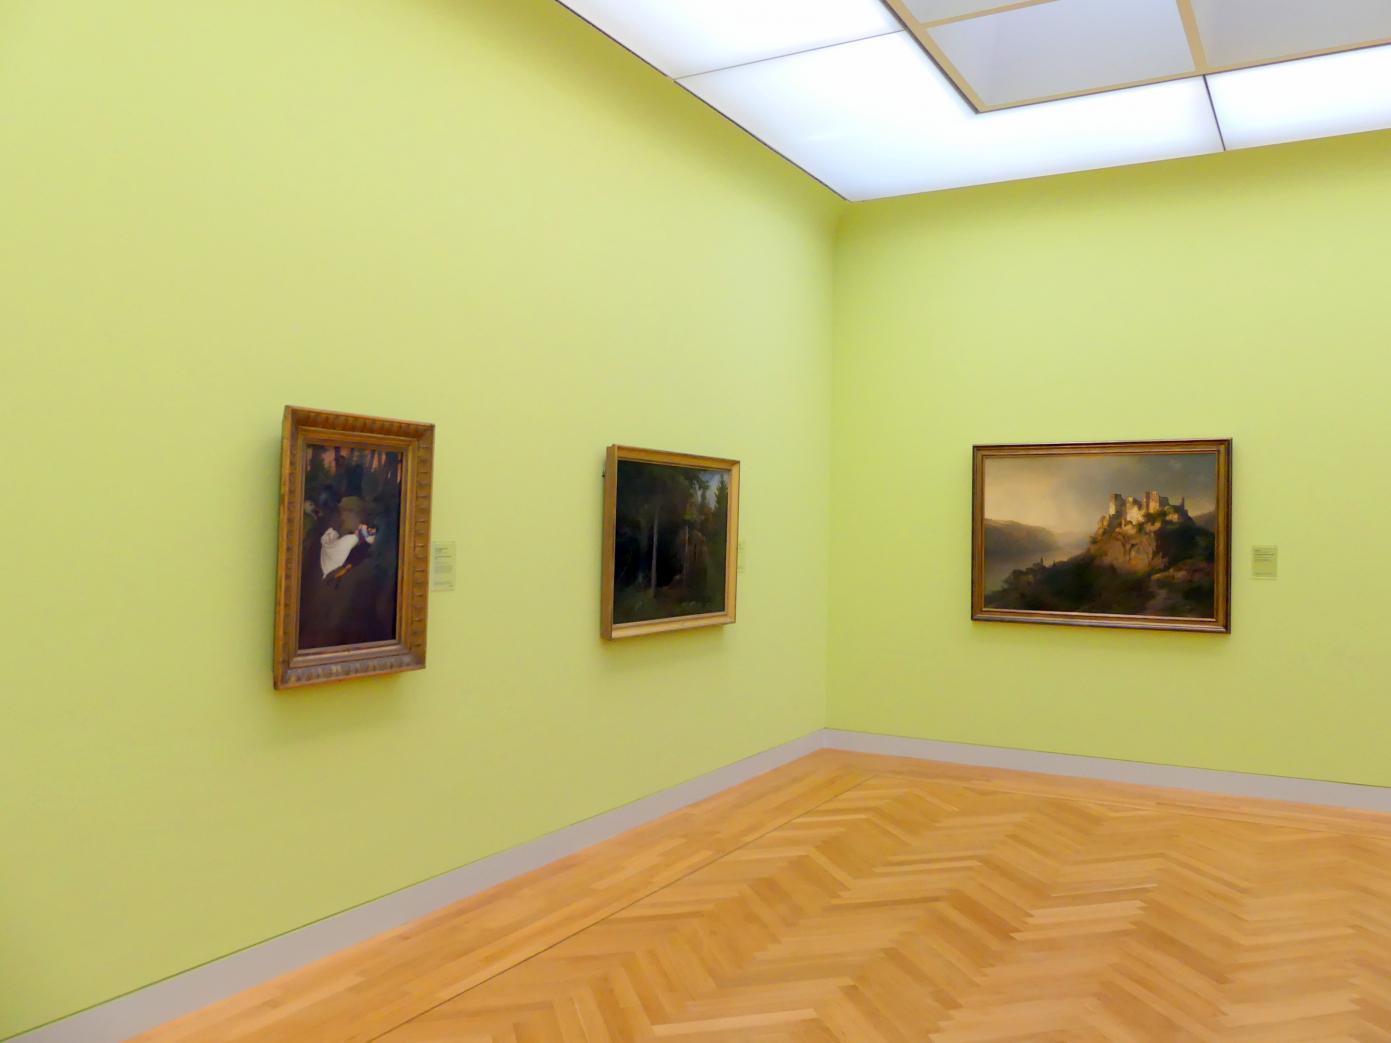 Schweinfurt, Museum Georg Schäfer, Saal 16, Bild 1/4